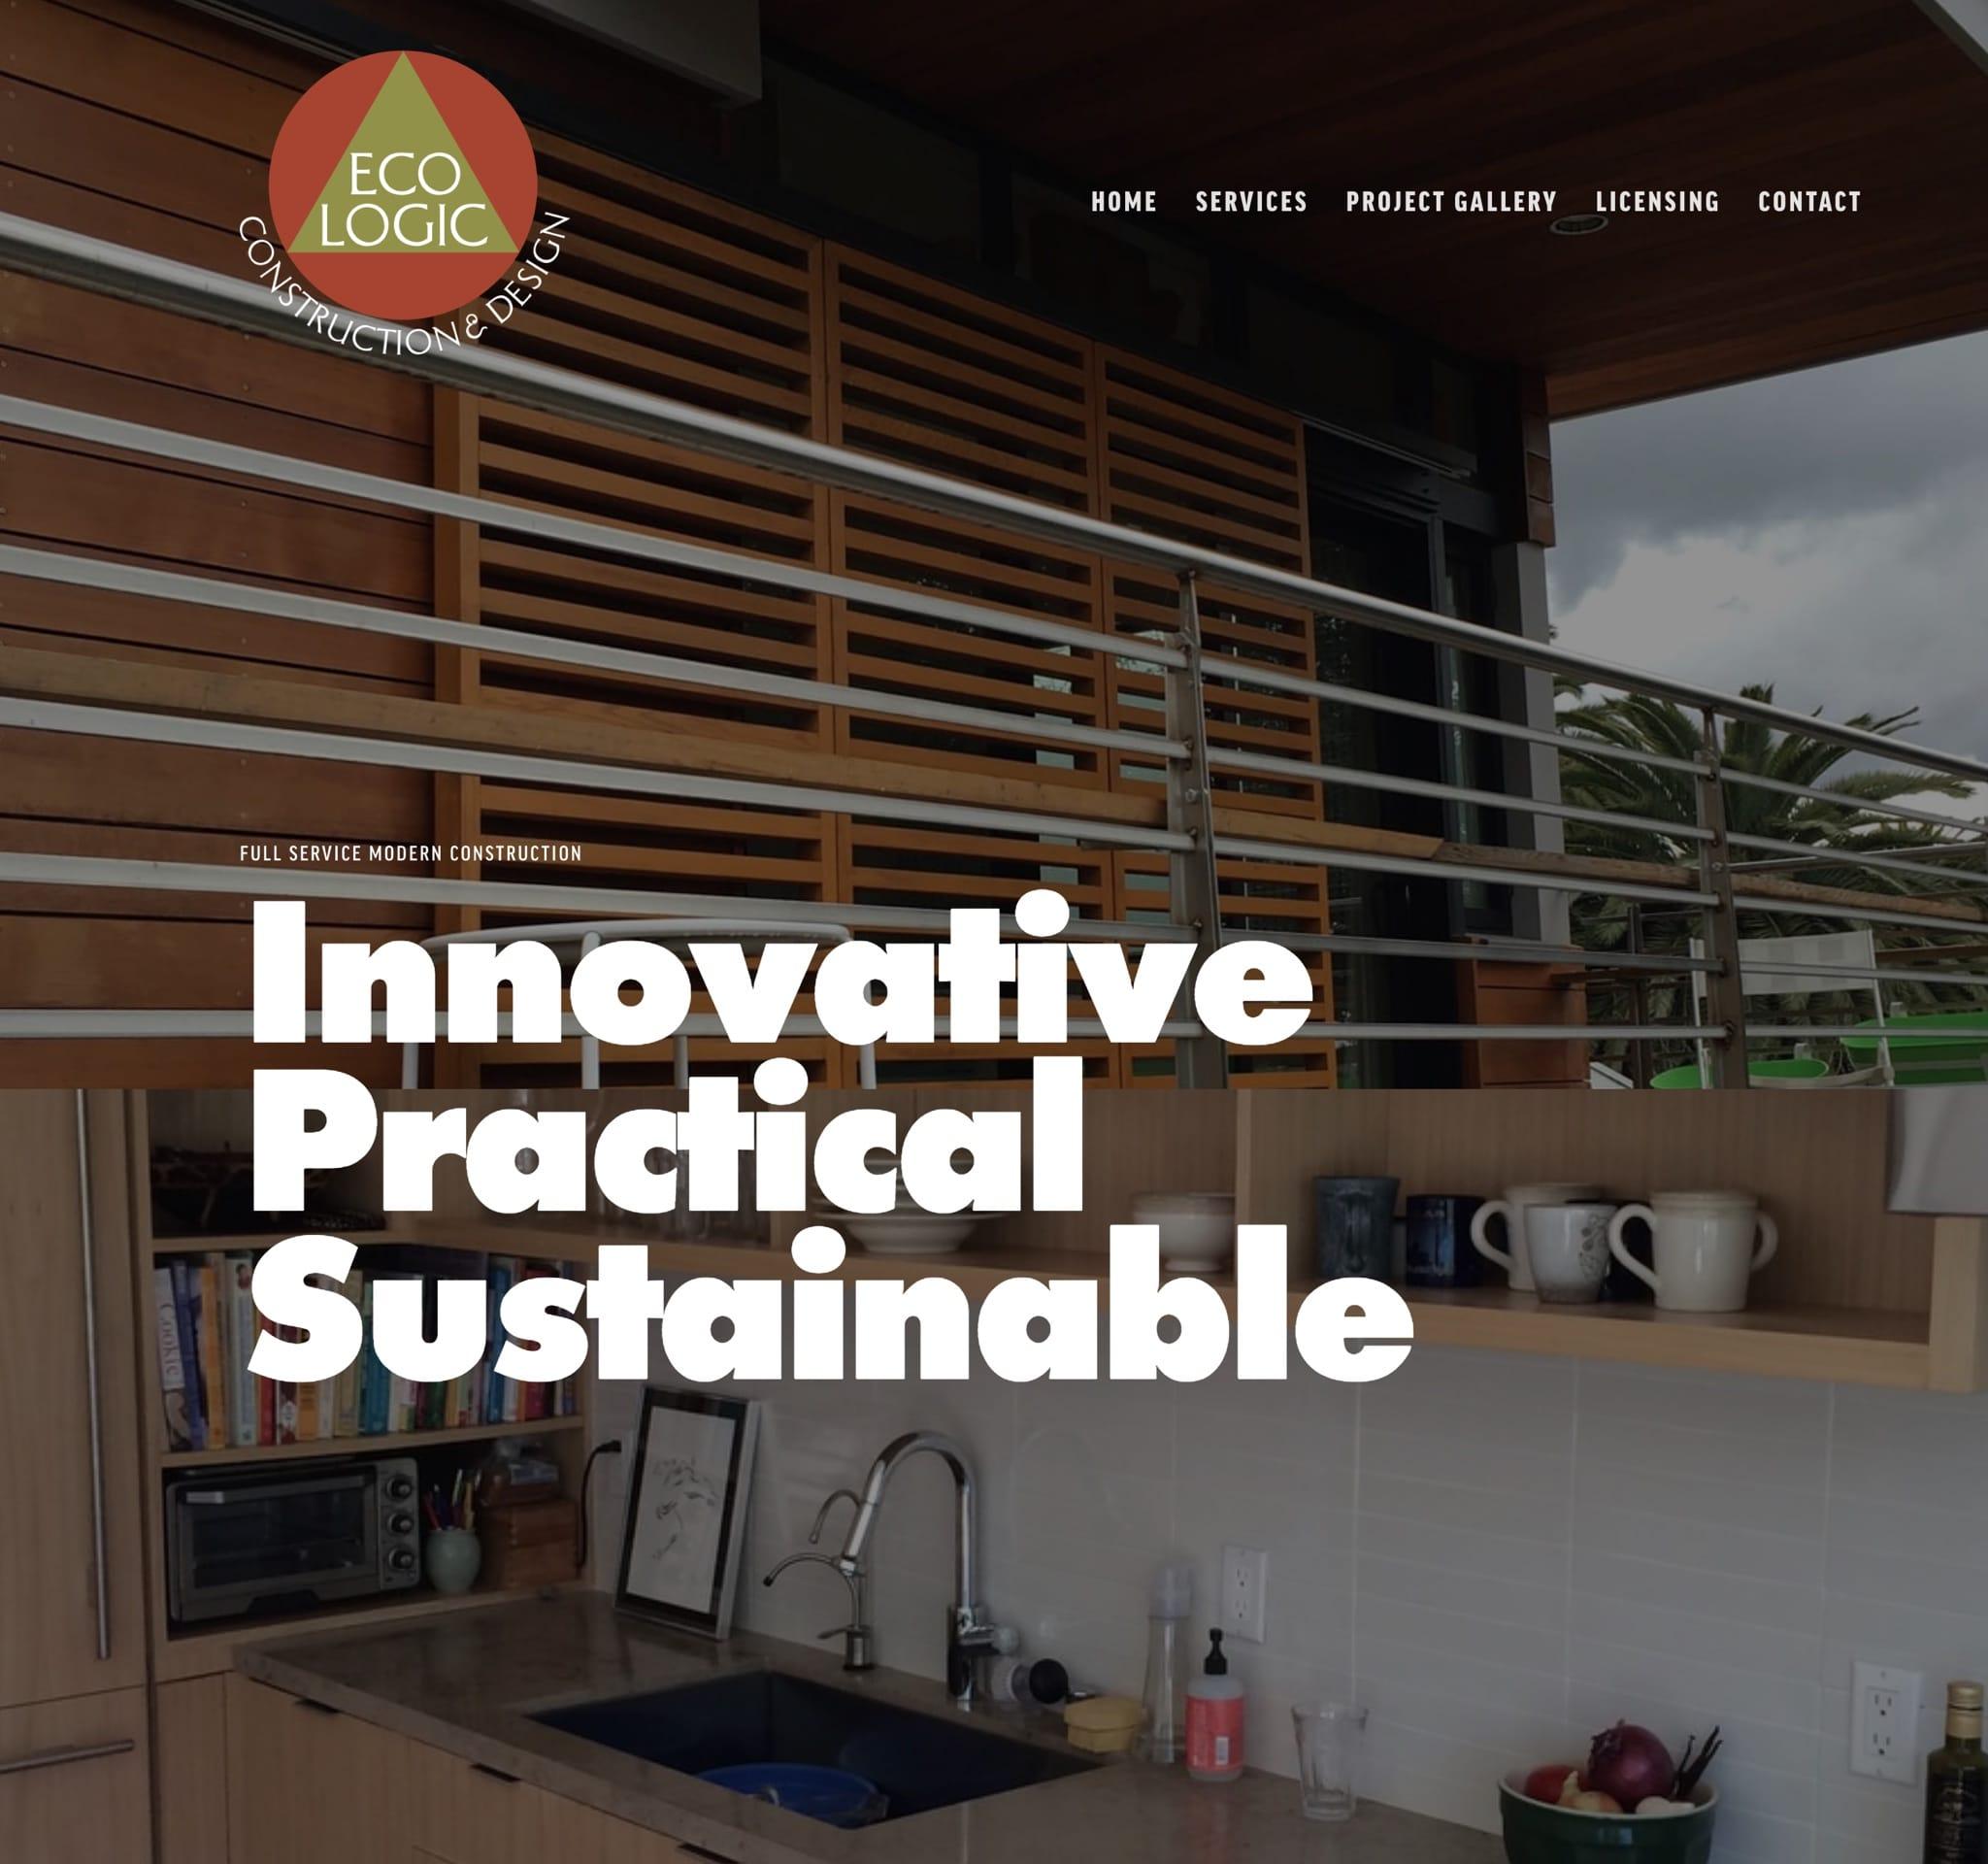 Ecologic Construction & Design